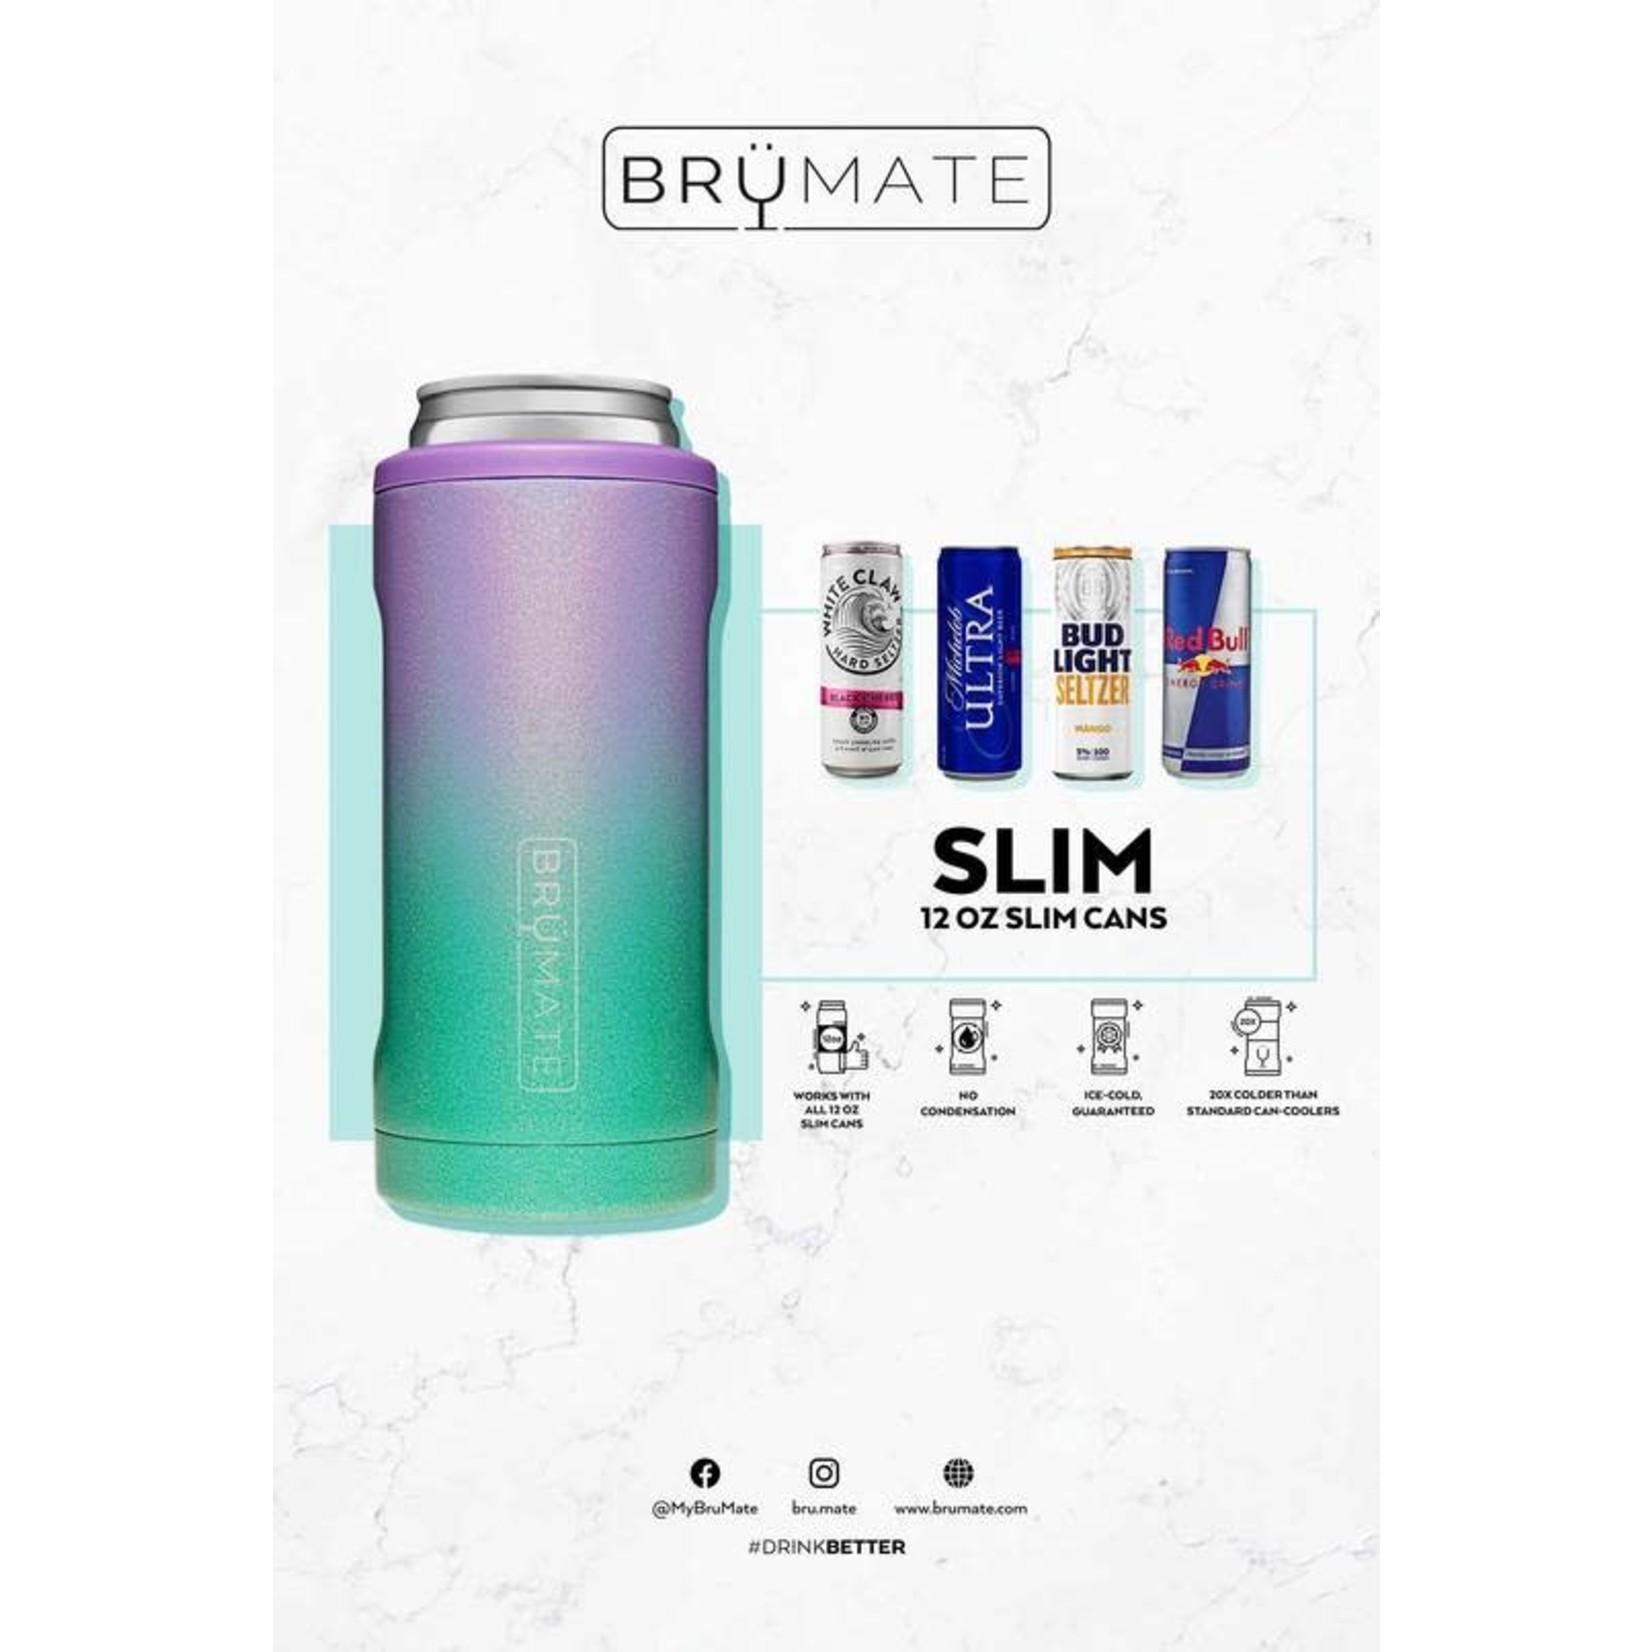 BruMate Hopsulator Slim in Glitter Blush